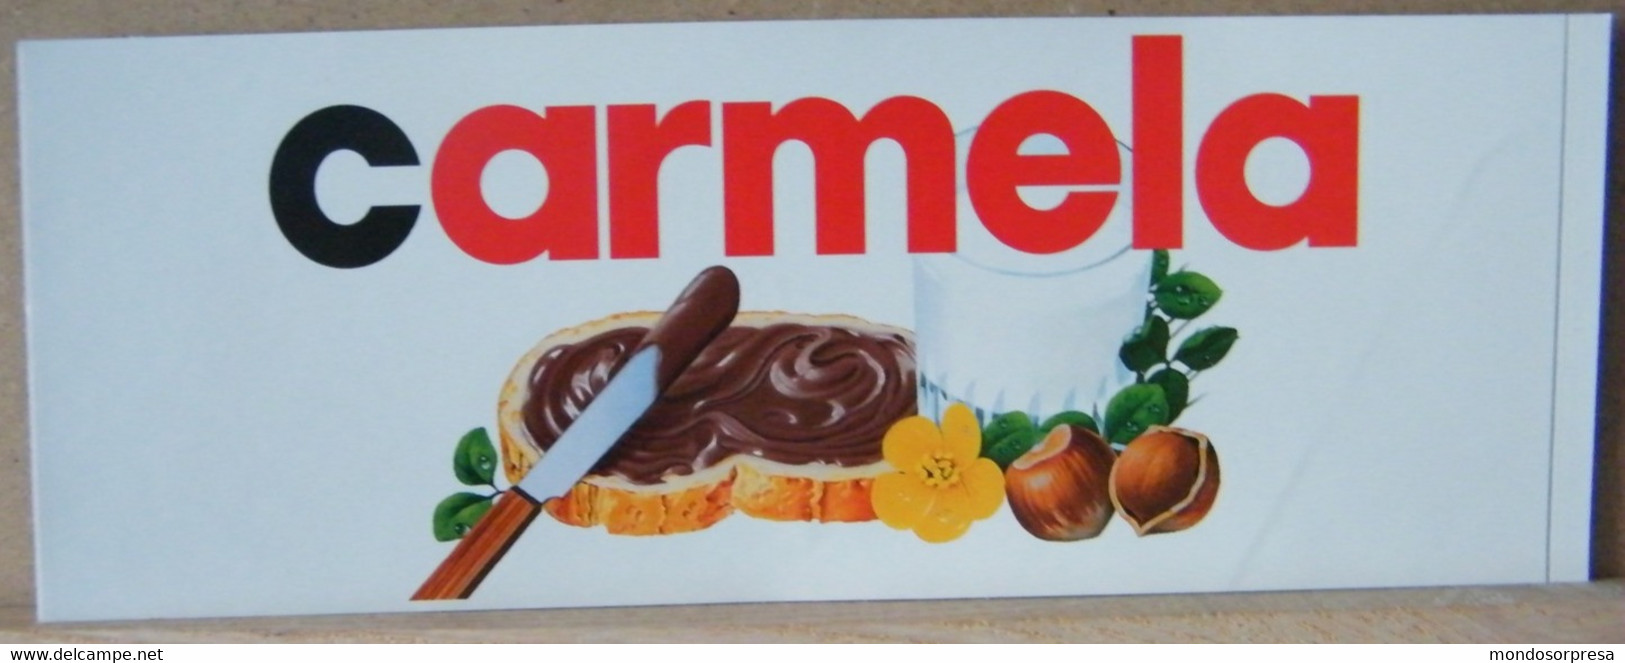 MONDOSORPRESA, ADESIVI NUTELLA NOMI, CARMELA - Nutella